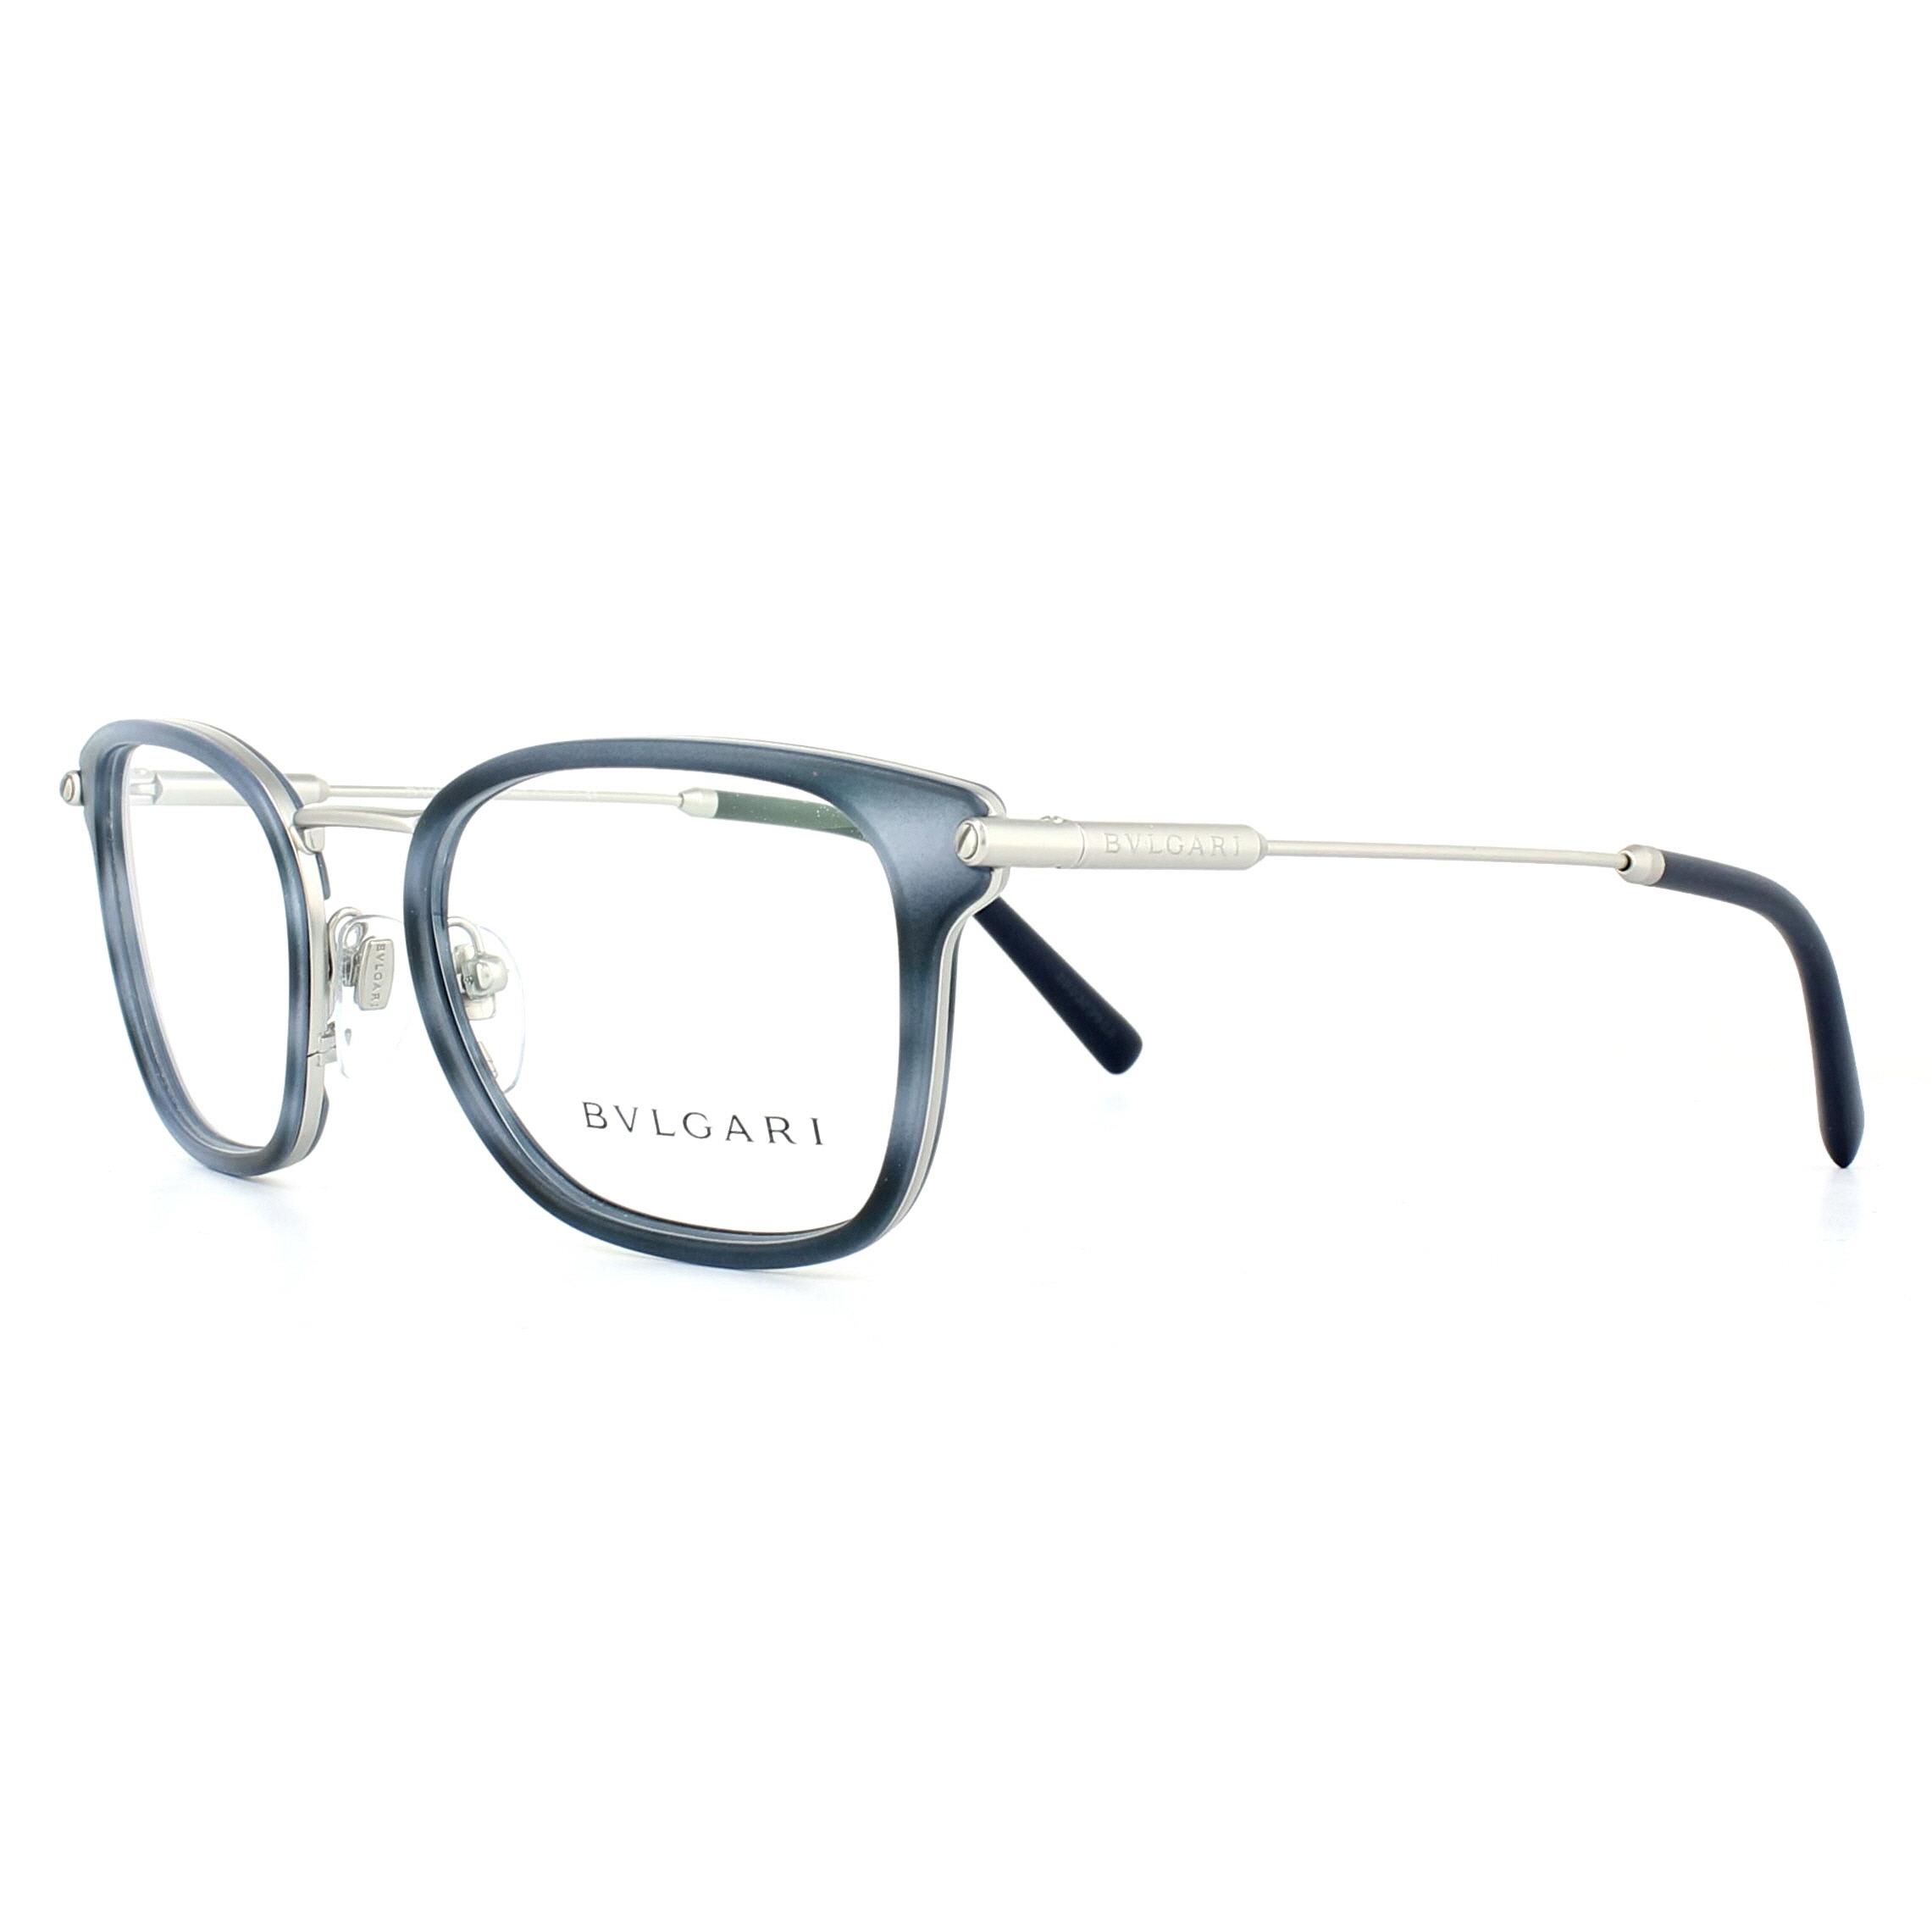 Bvlgari Glasses Frames 1095 400 Grey Blue Stripe & Matte Silver 51mm ...